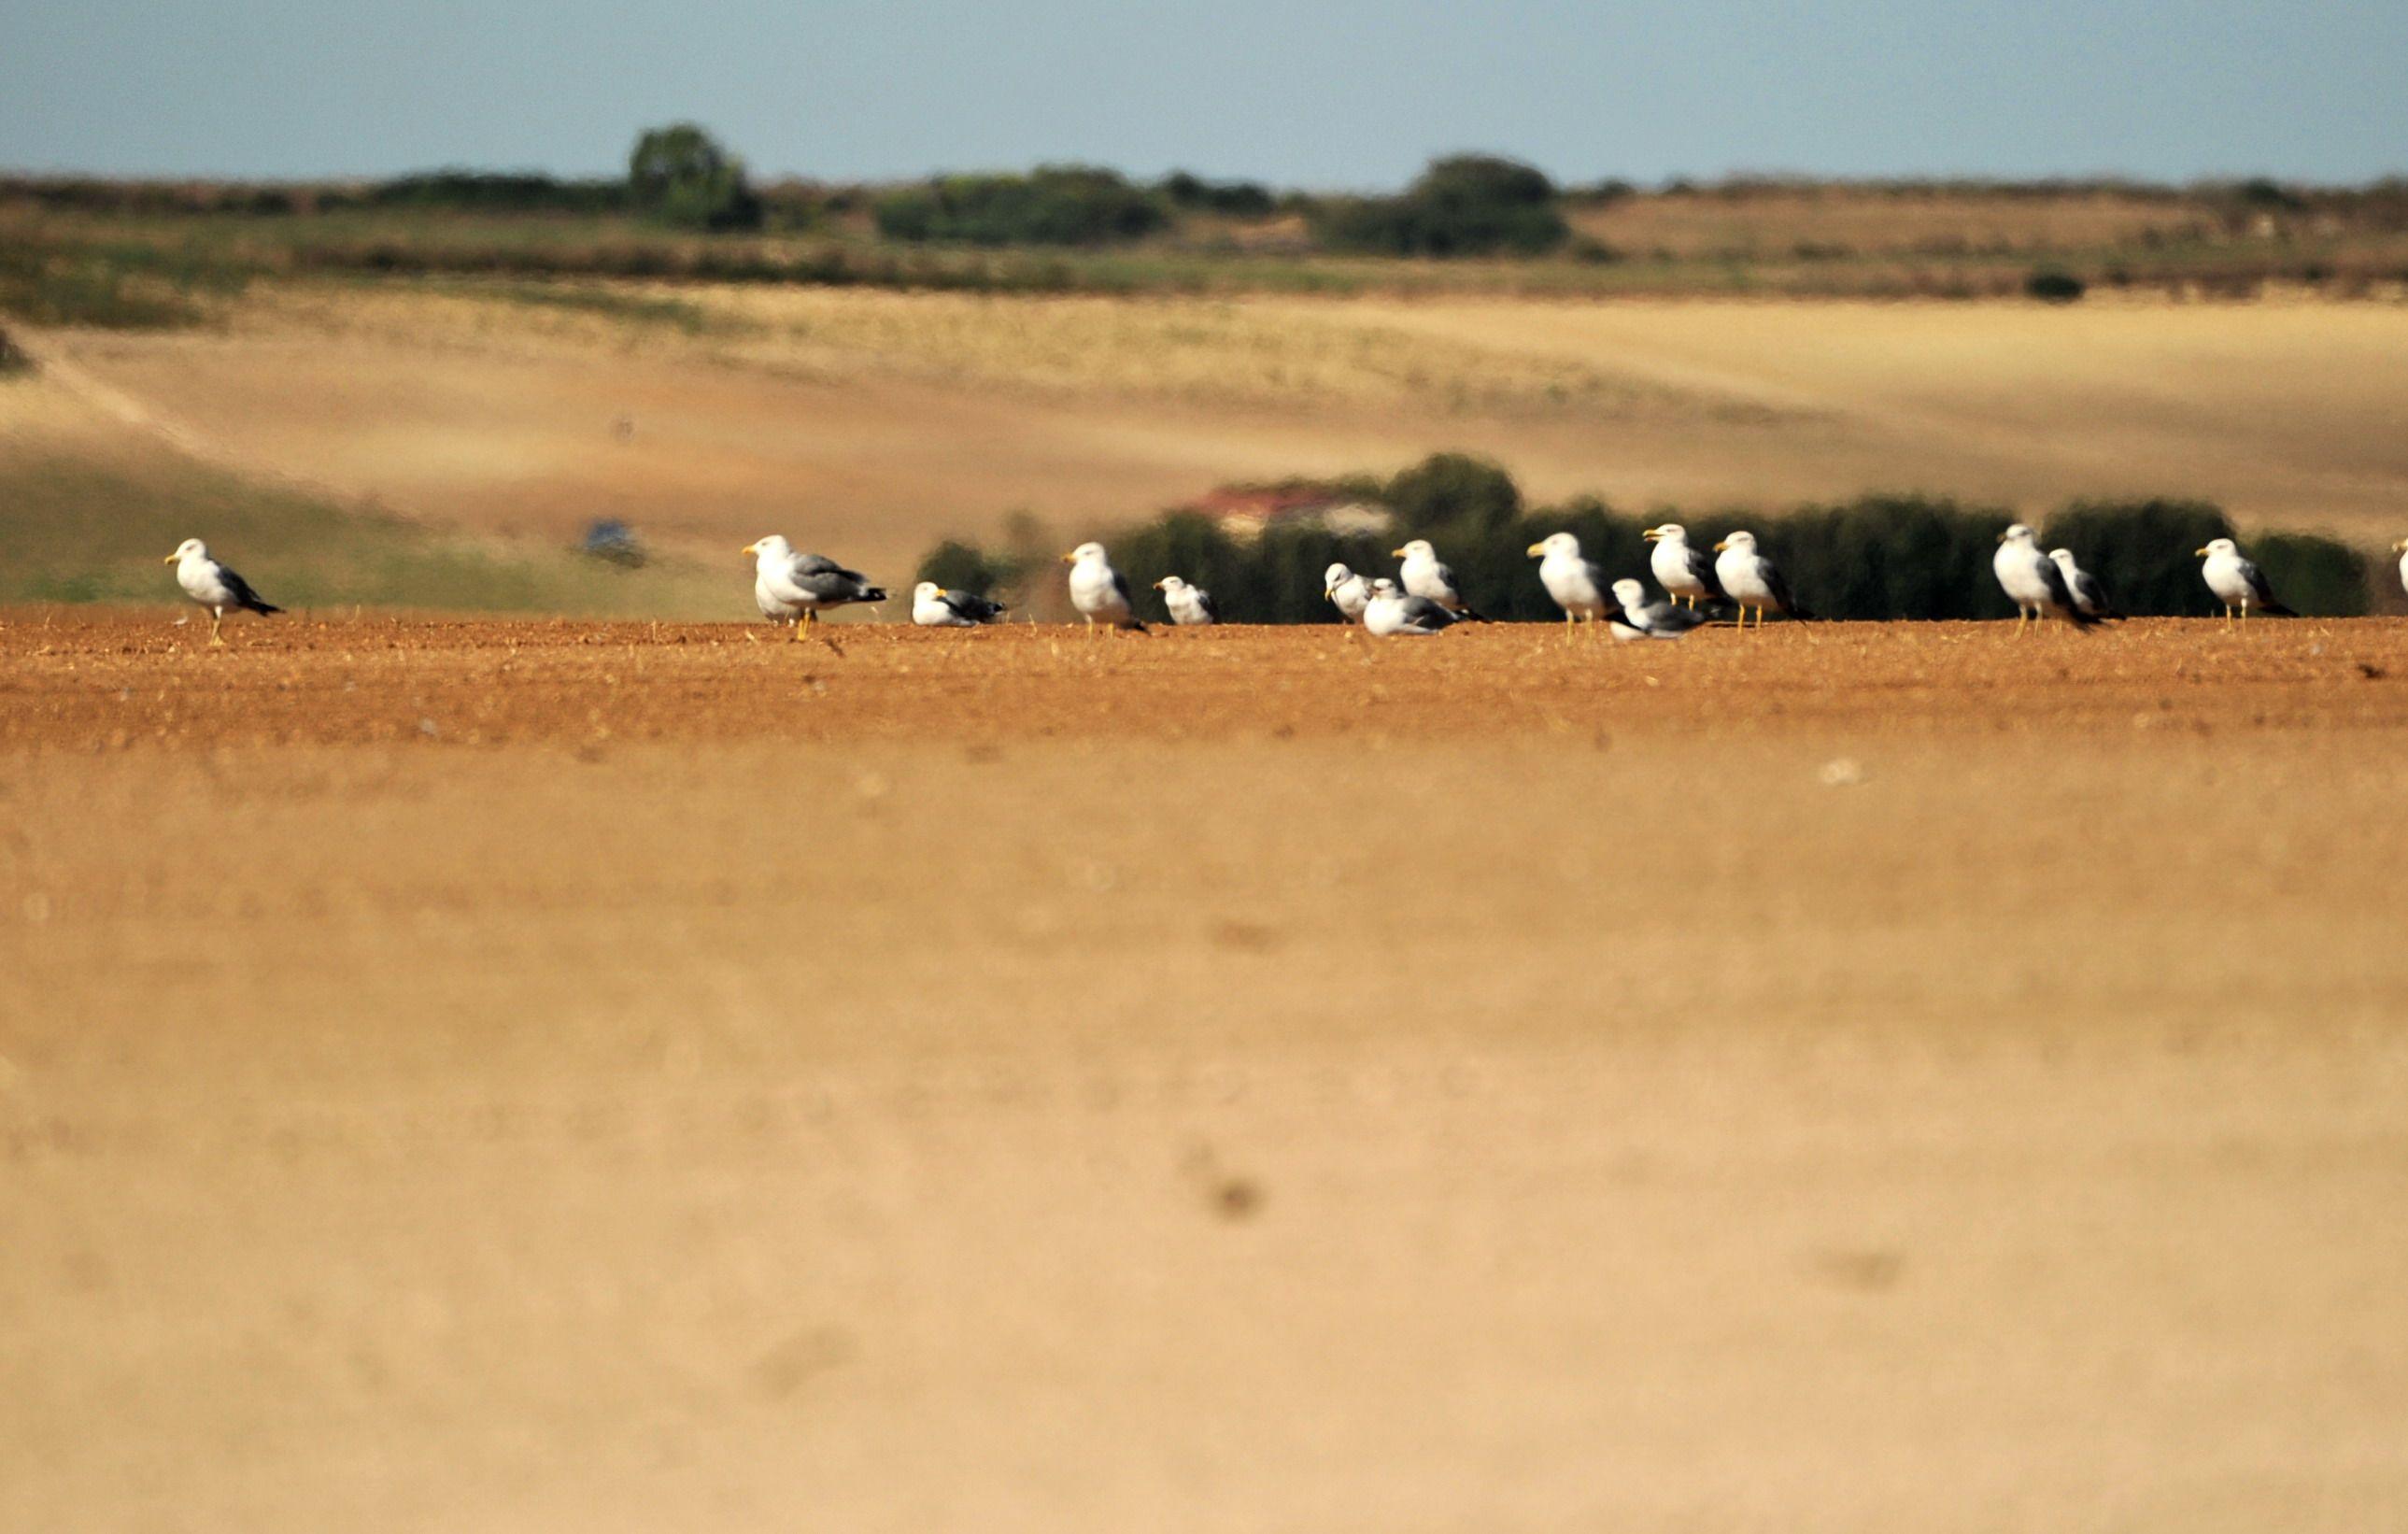 Sinis di Riola, Photo GF, Nikon D700 + 200 400 f/4 1/1600 sec. ISO360 400 mm f4 17/08/2014 07:29am #guidofrilli - Gabbiano reale - Pauli Murtas